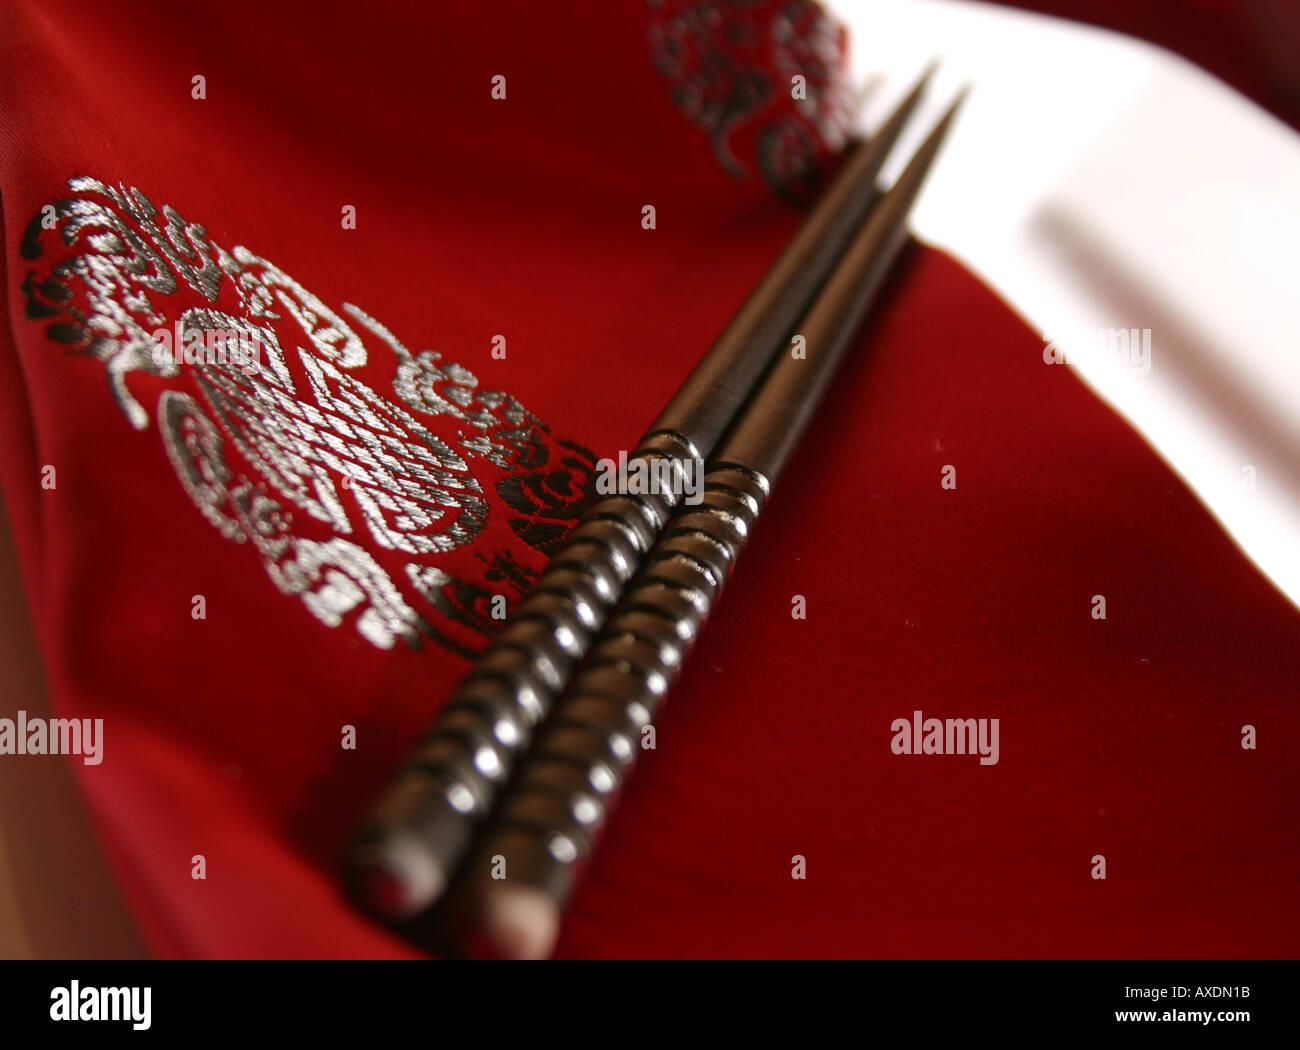 Chopsticks on a plate - formal dinner setting Stock Photo